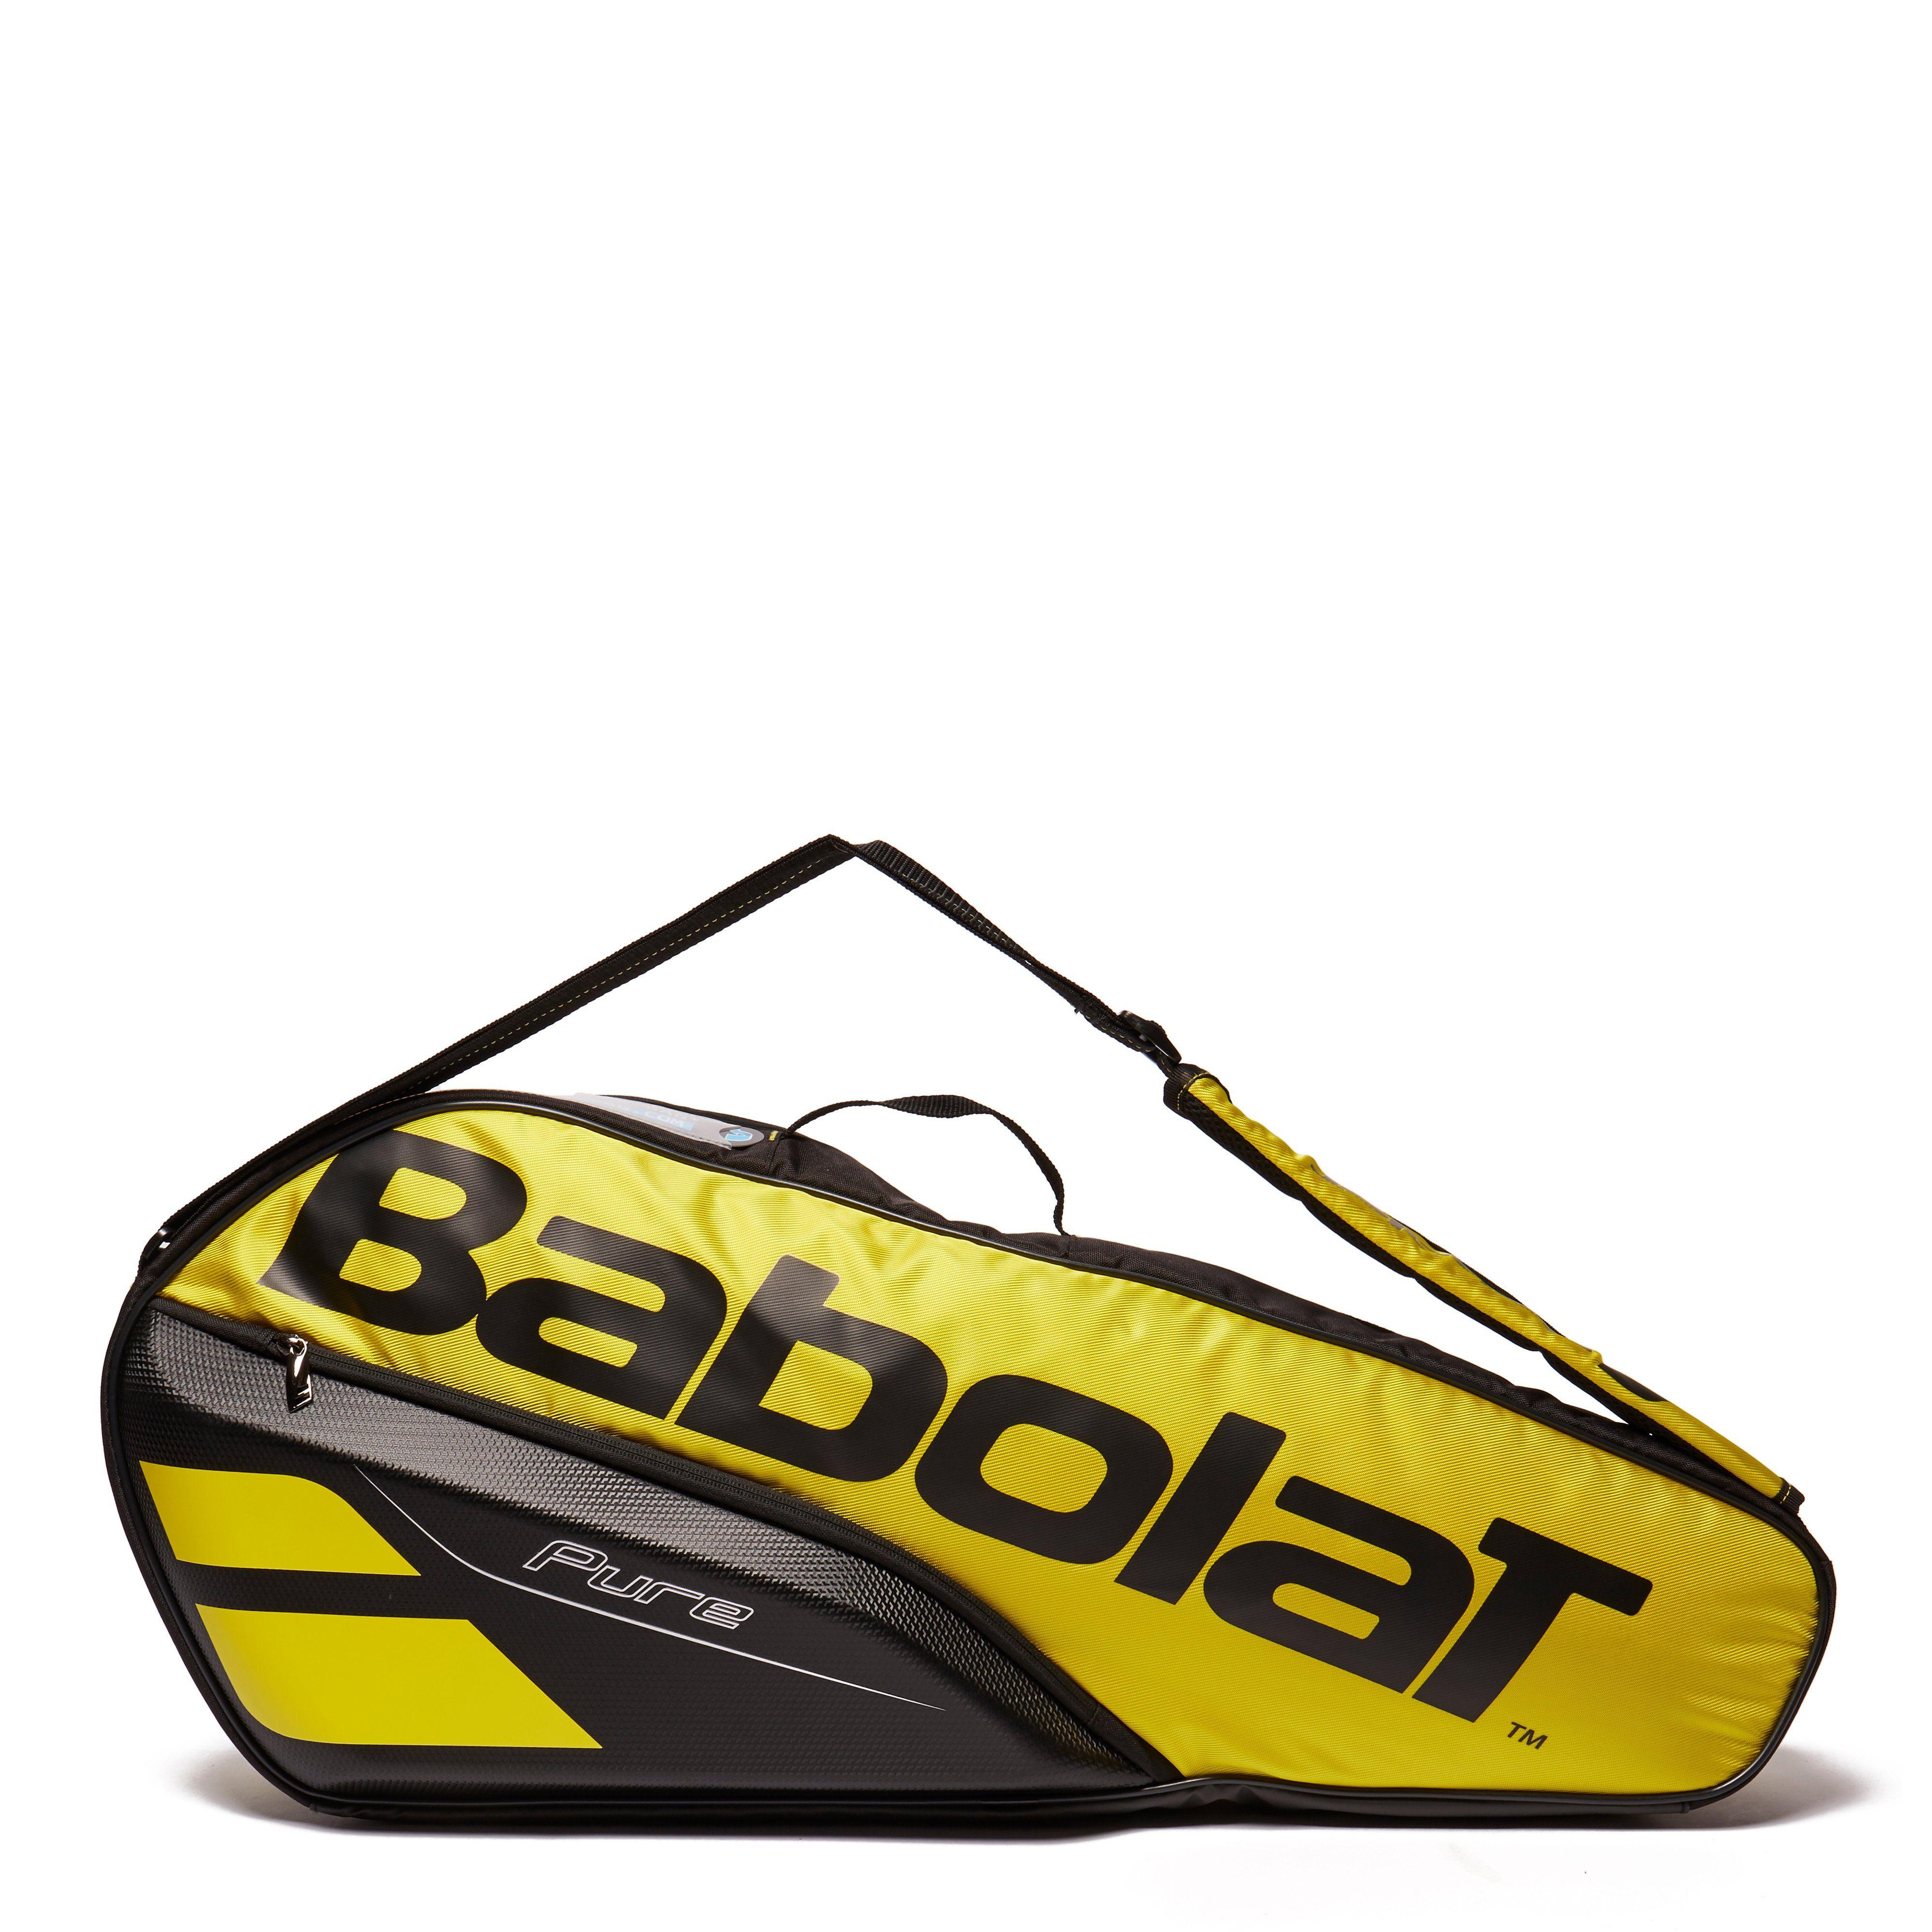 Babolat Pure Aero X3 Racket Bag